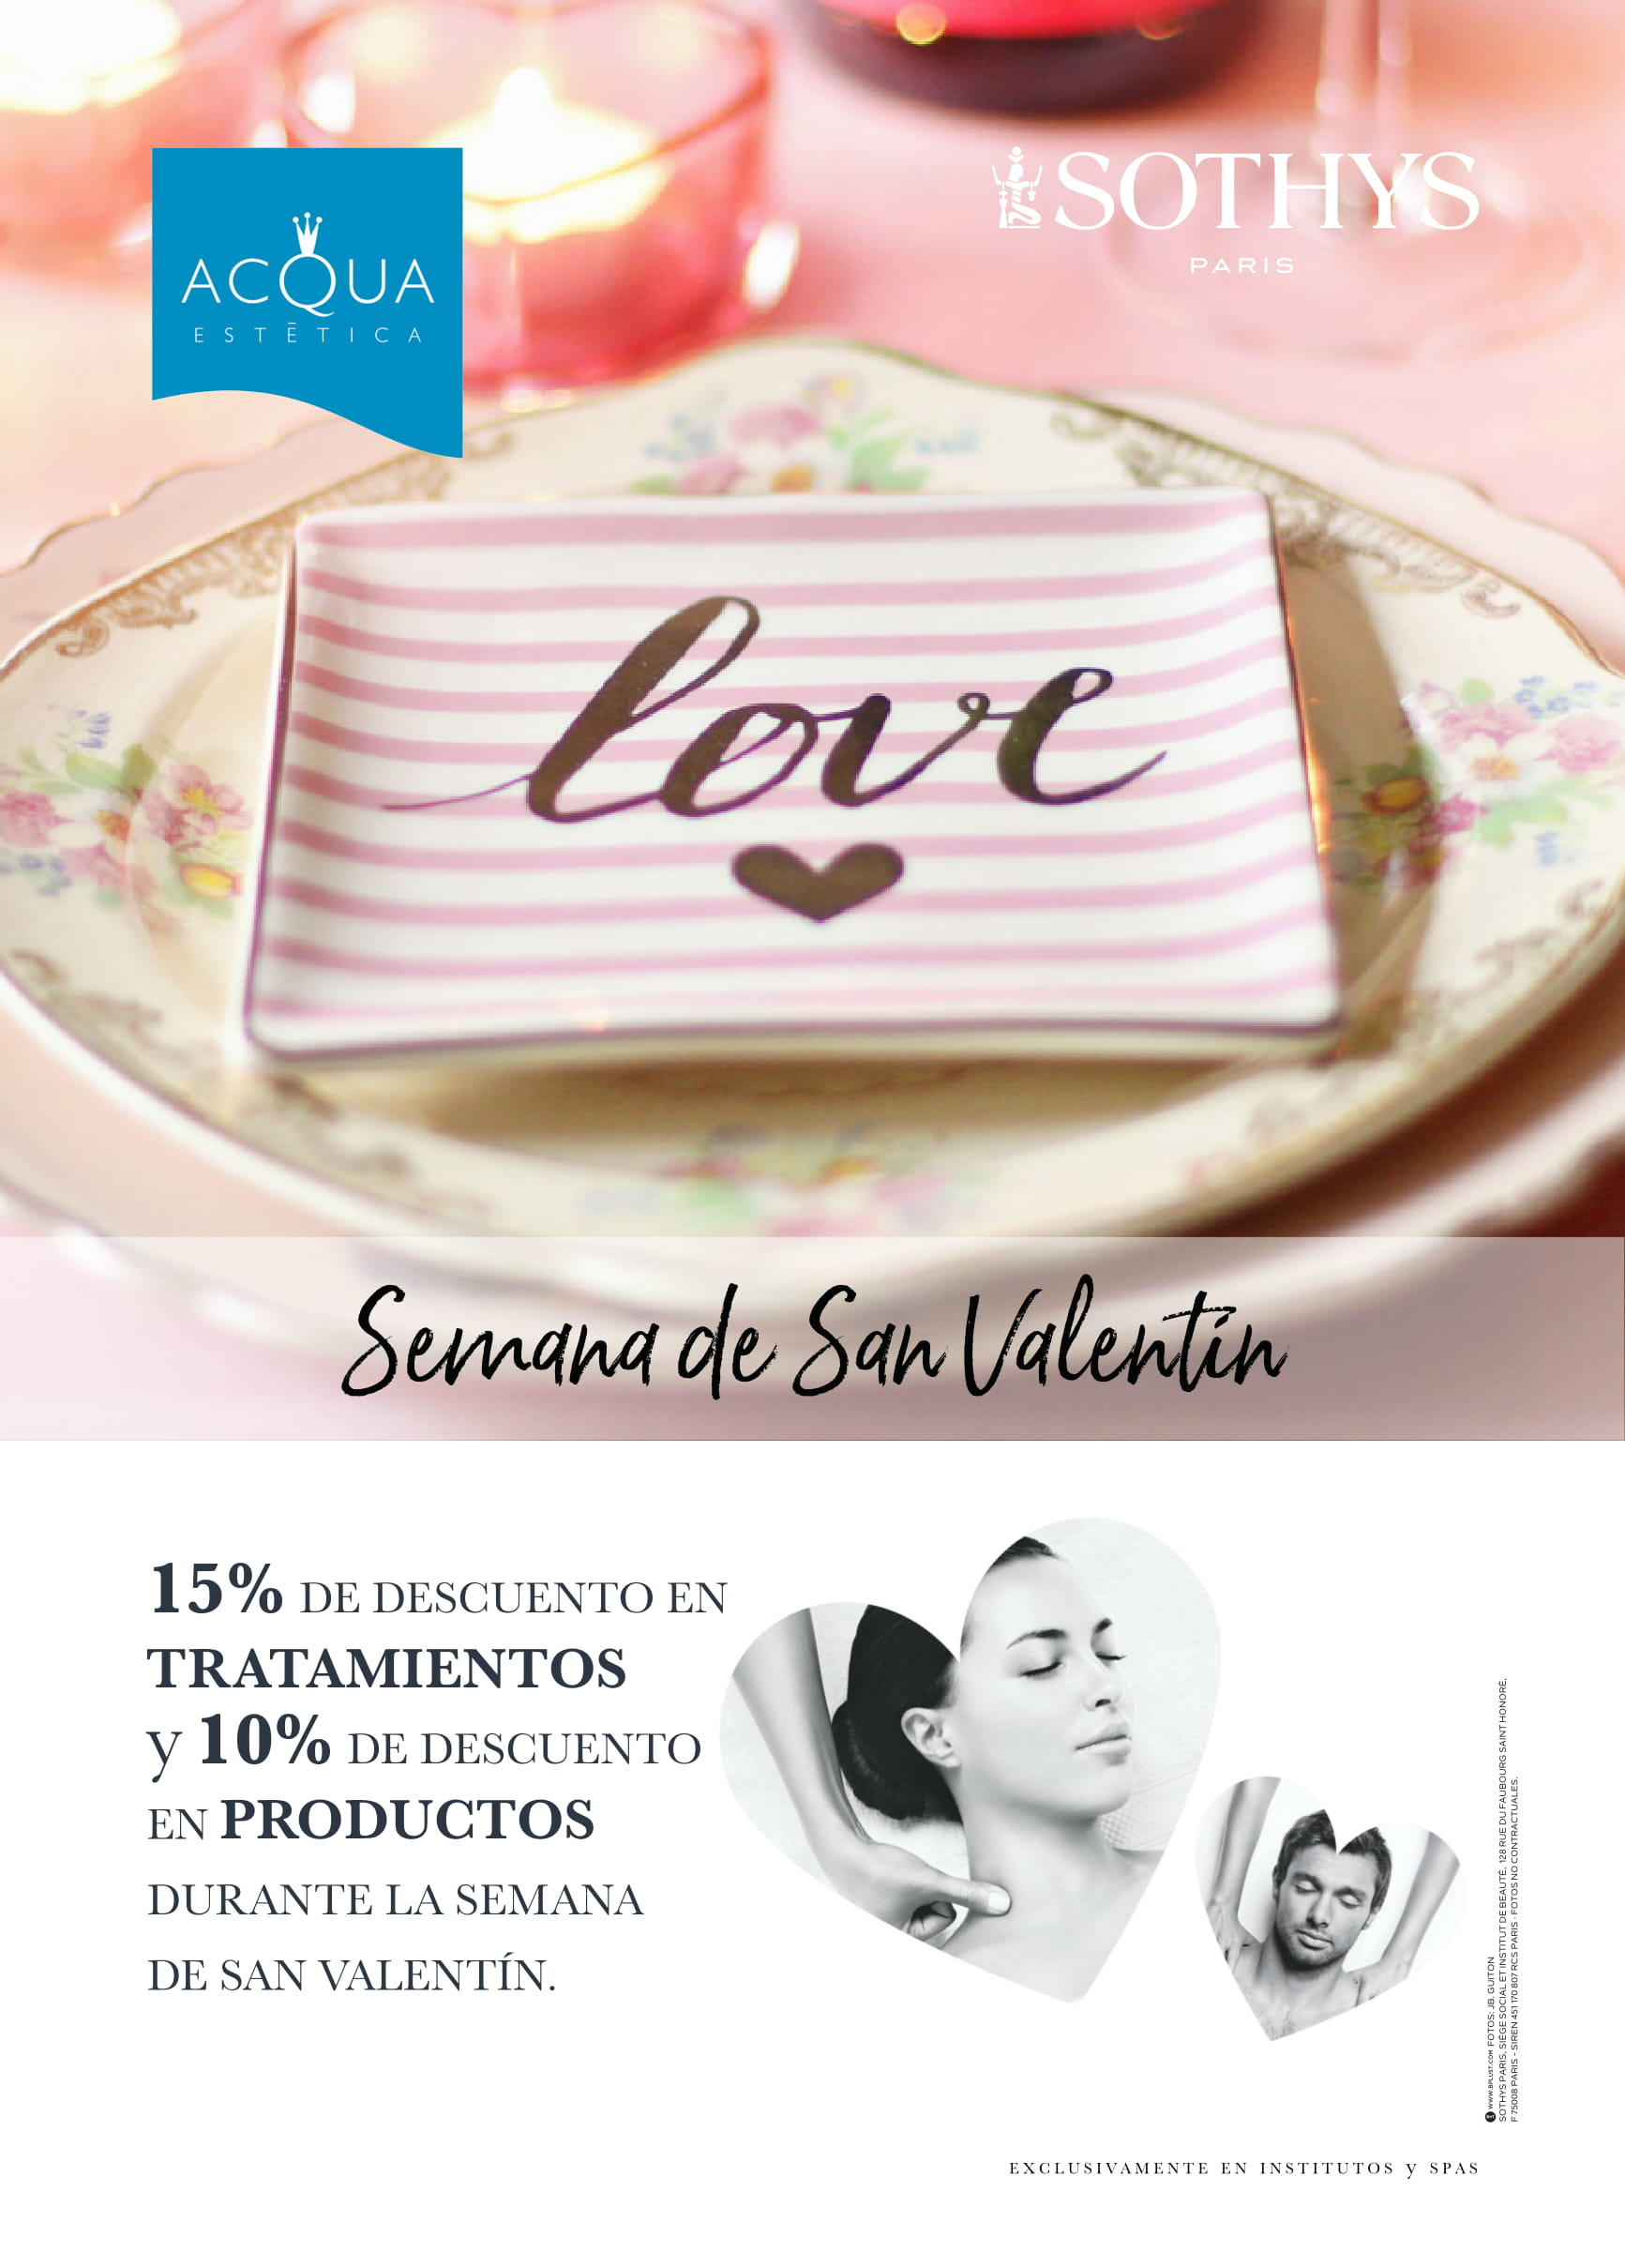 [PROMO FINALIZADA] Semana de San Valentín